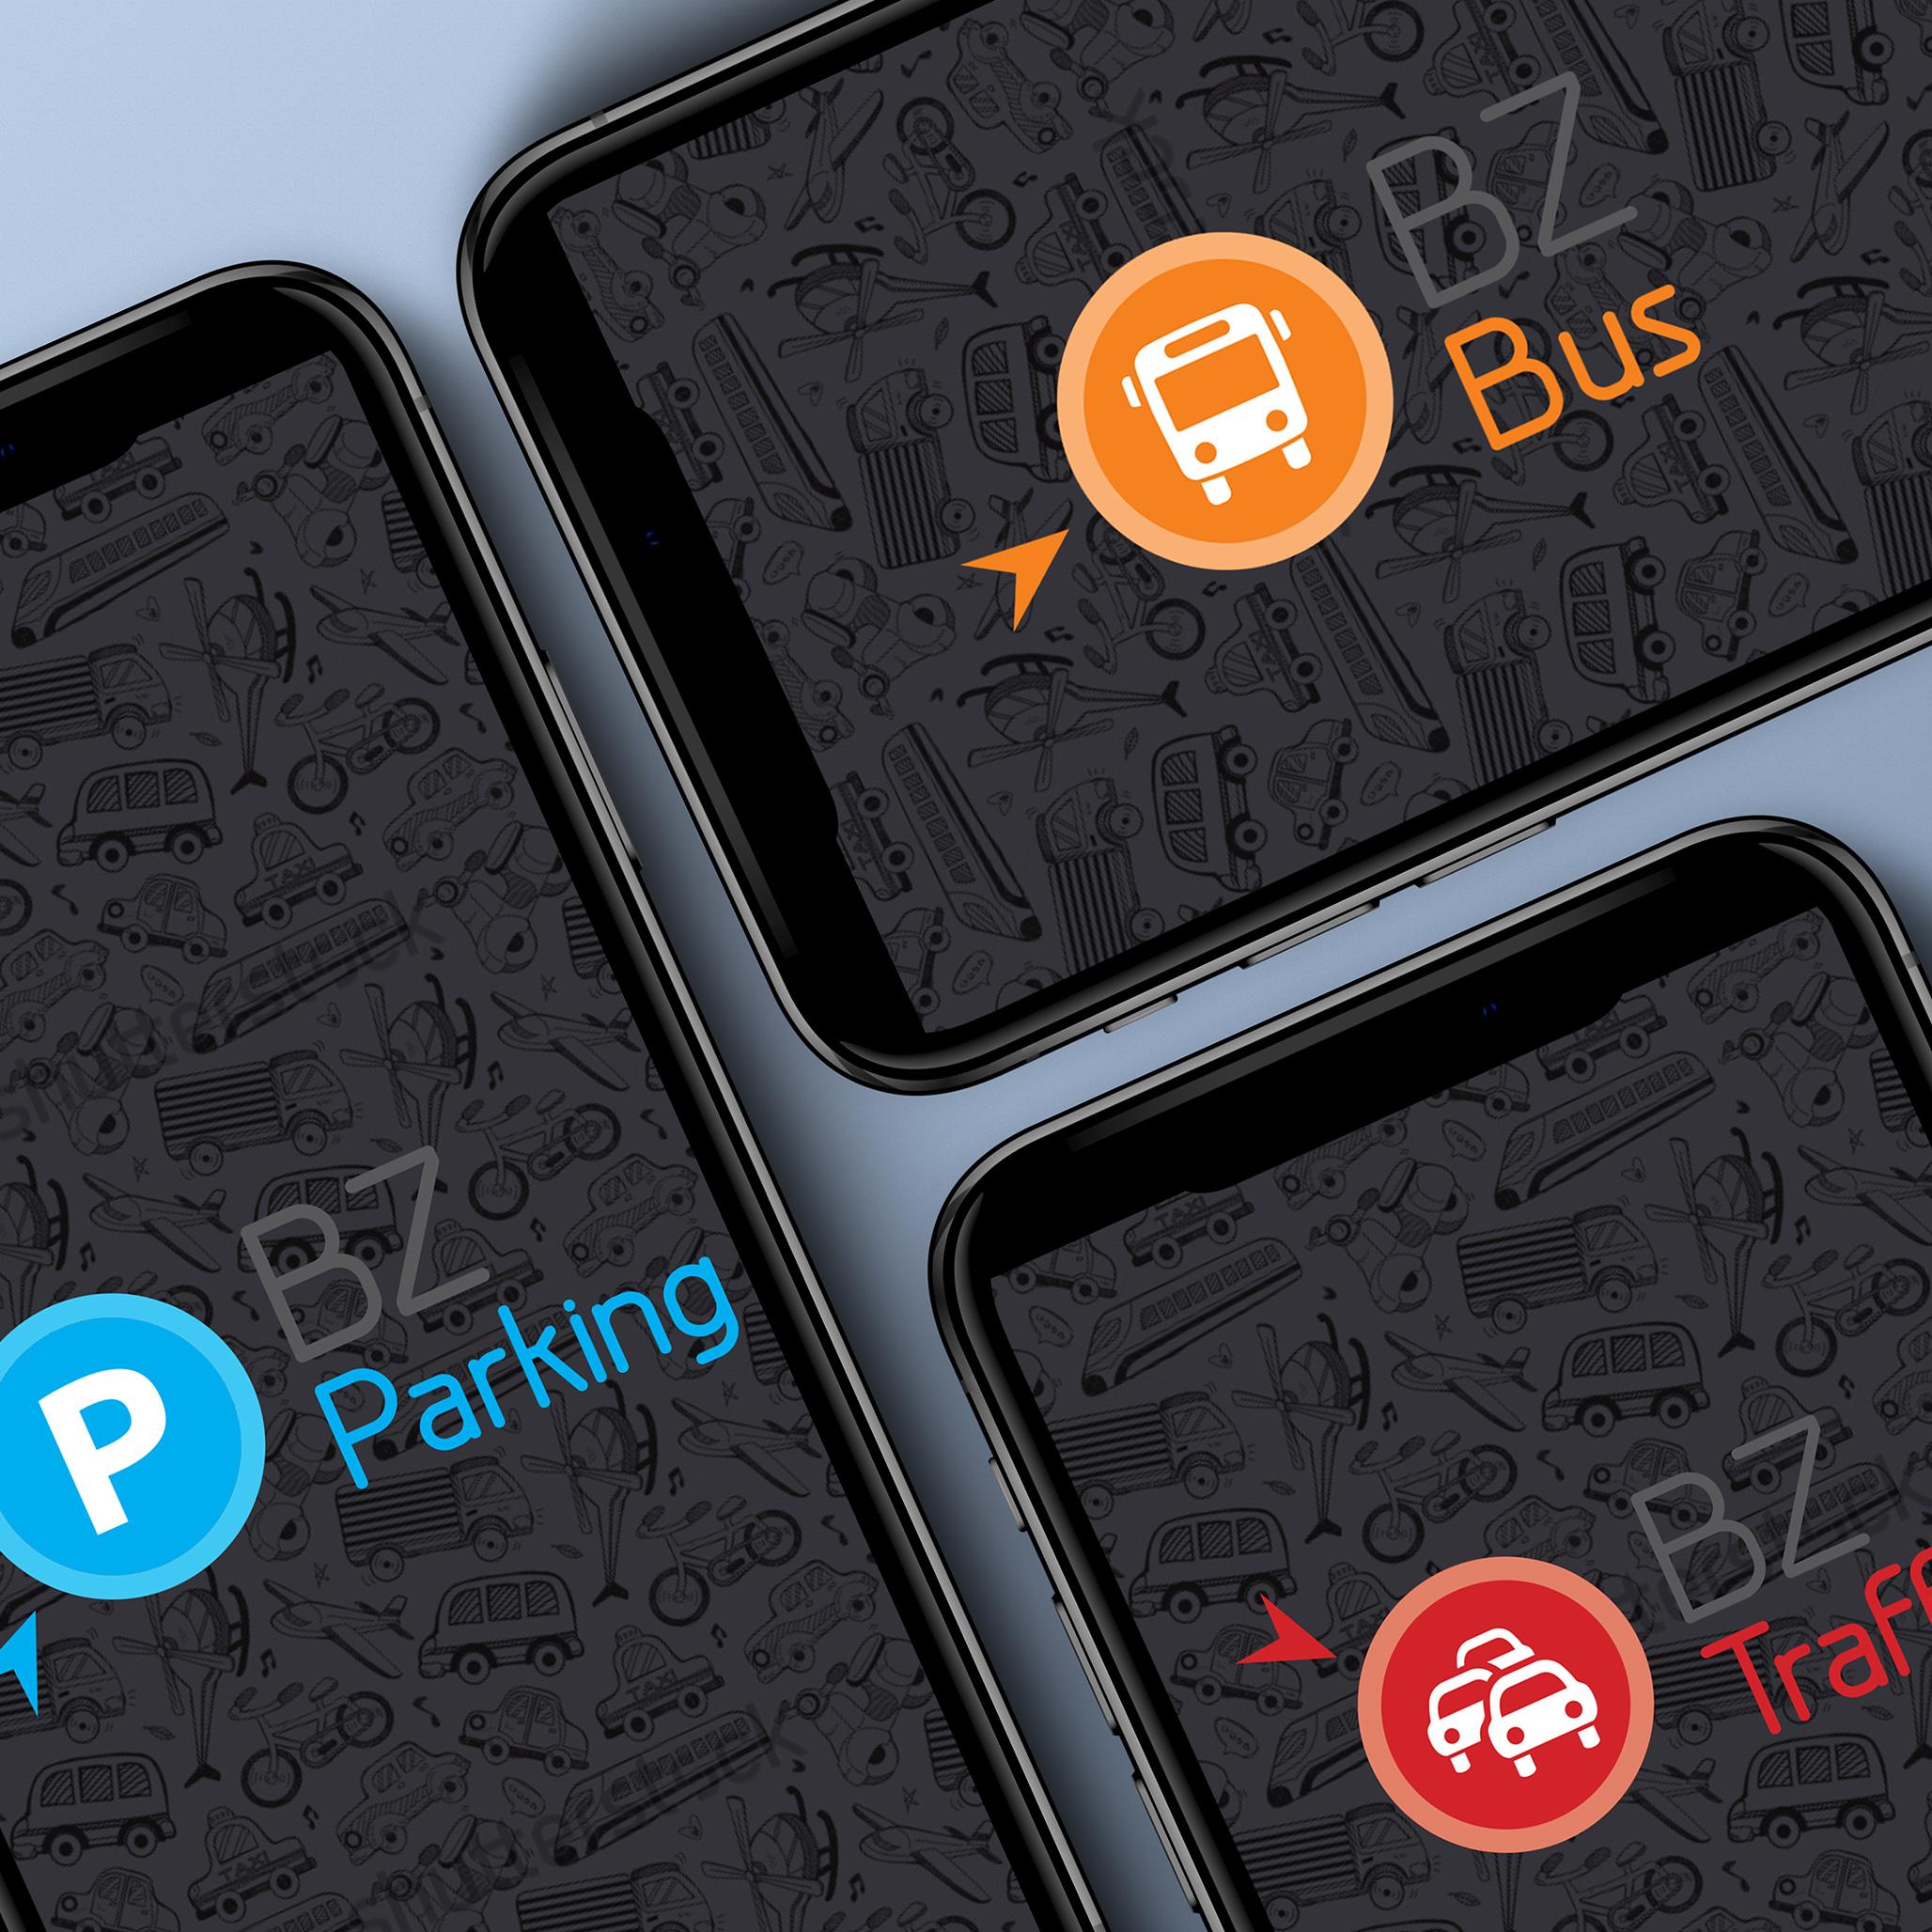 Bz Apps